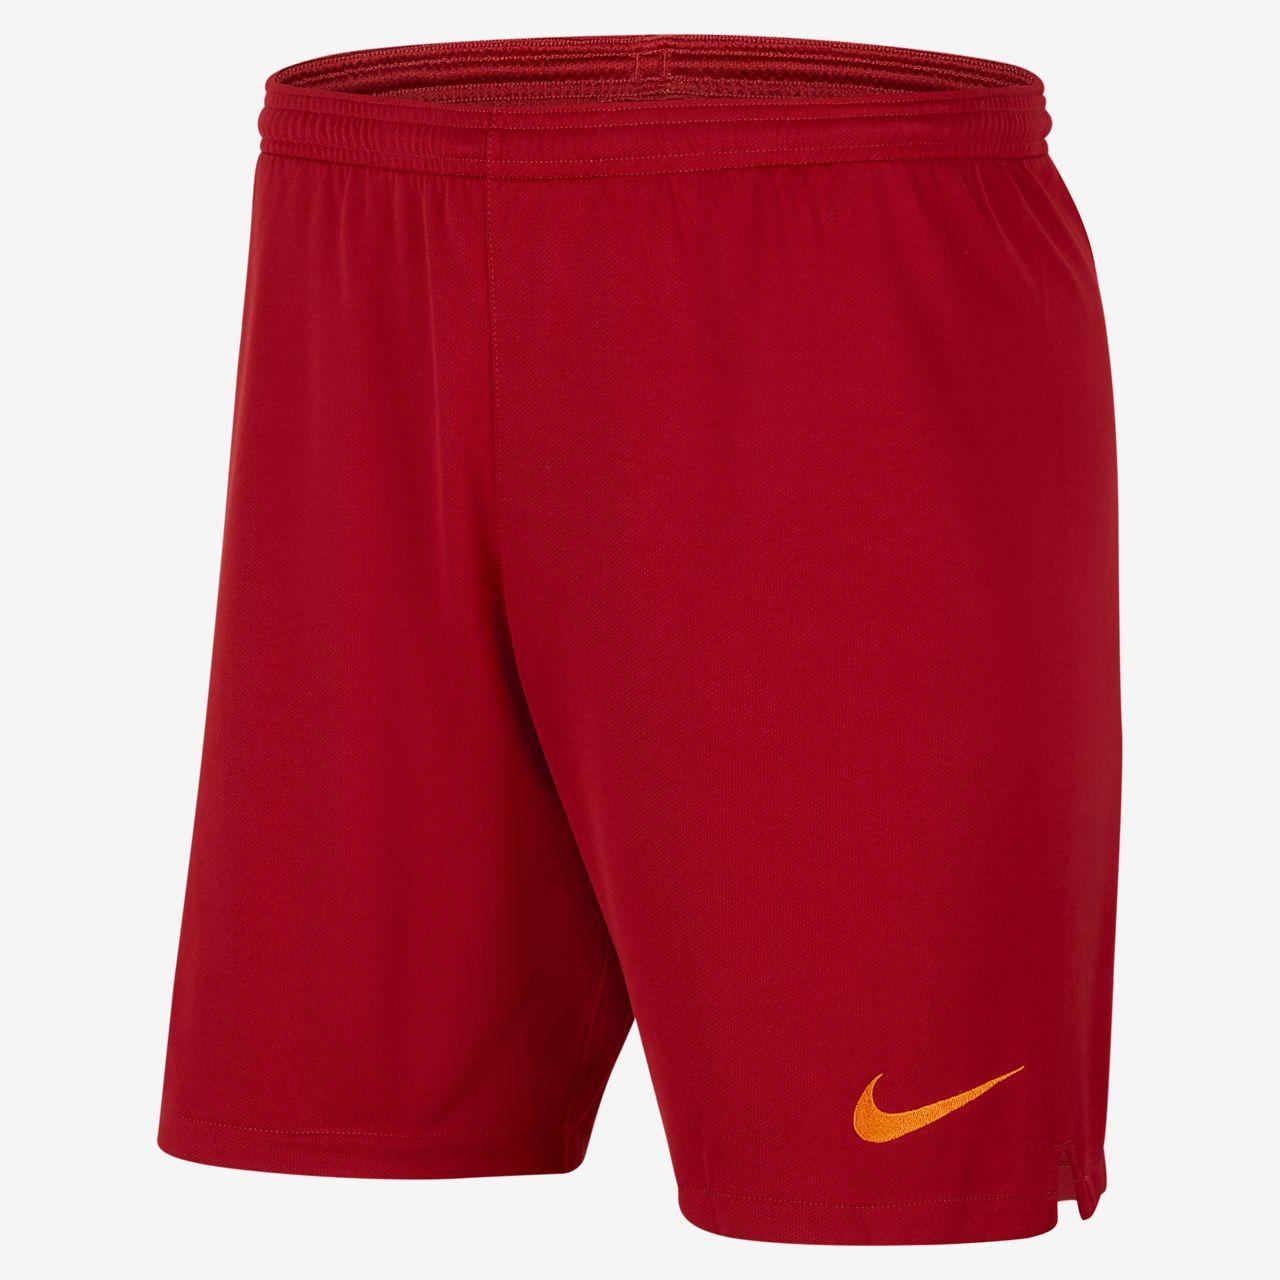 Shorts da calcio Galatasaray 2019/20 Stadium Home/Away - Uomo